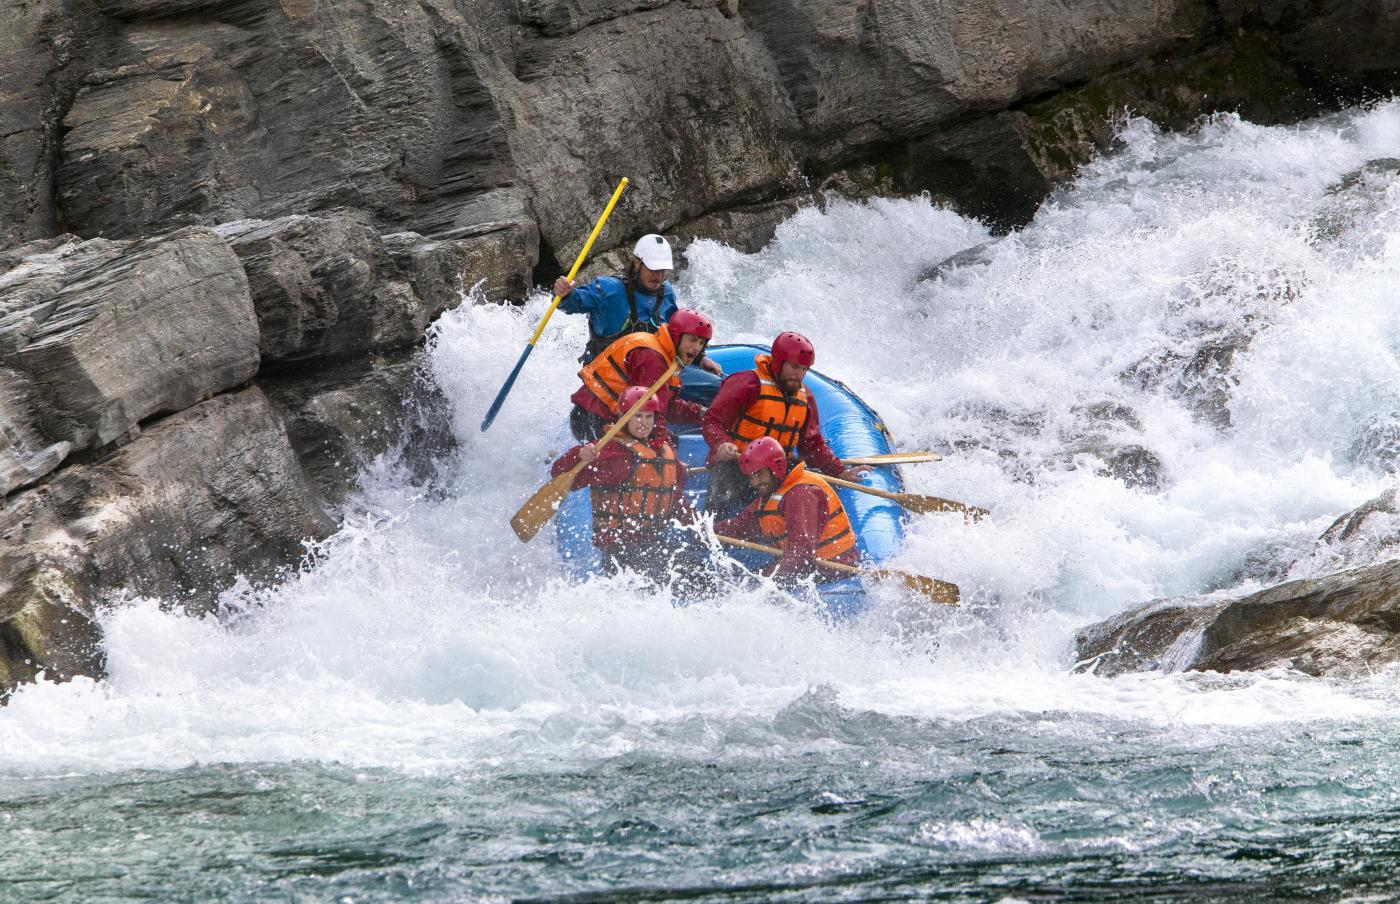 Whitewater rafting with Go Orange